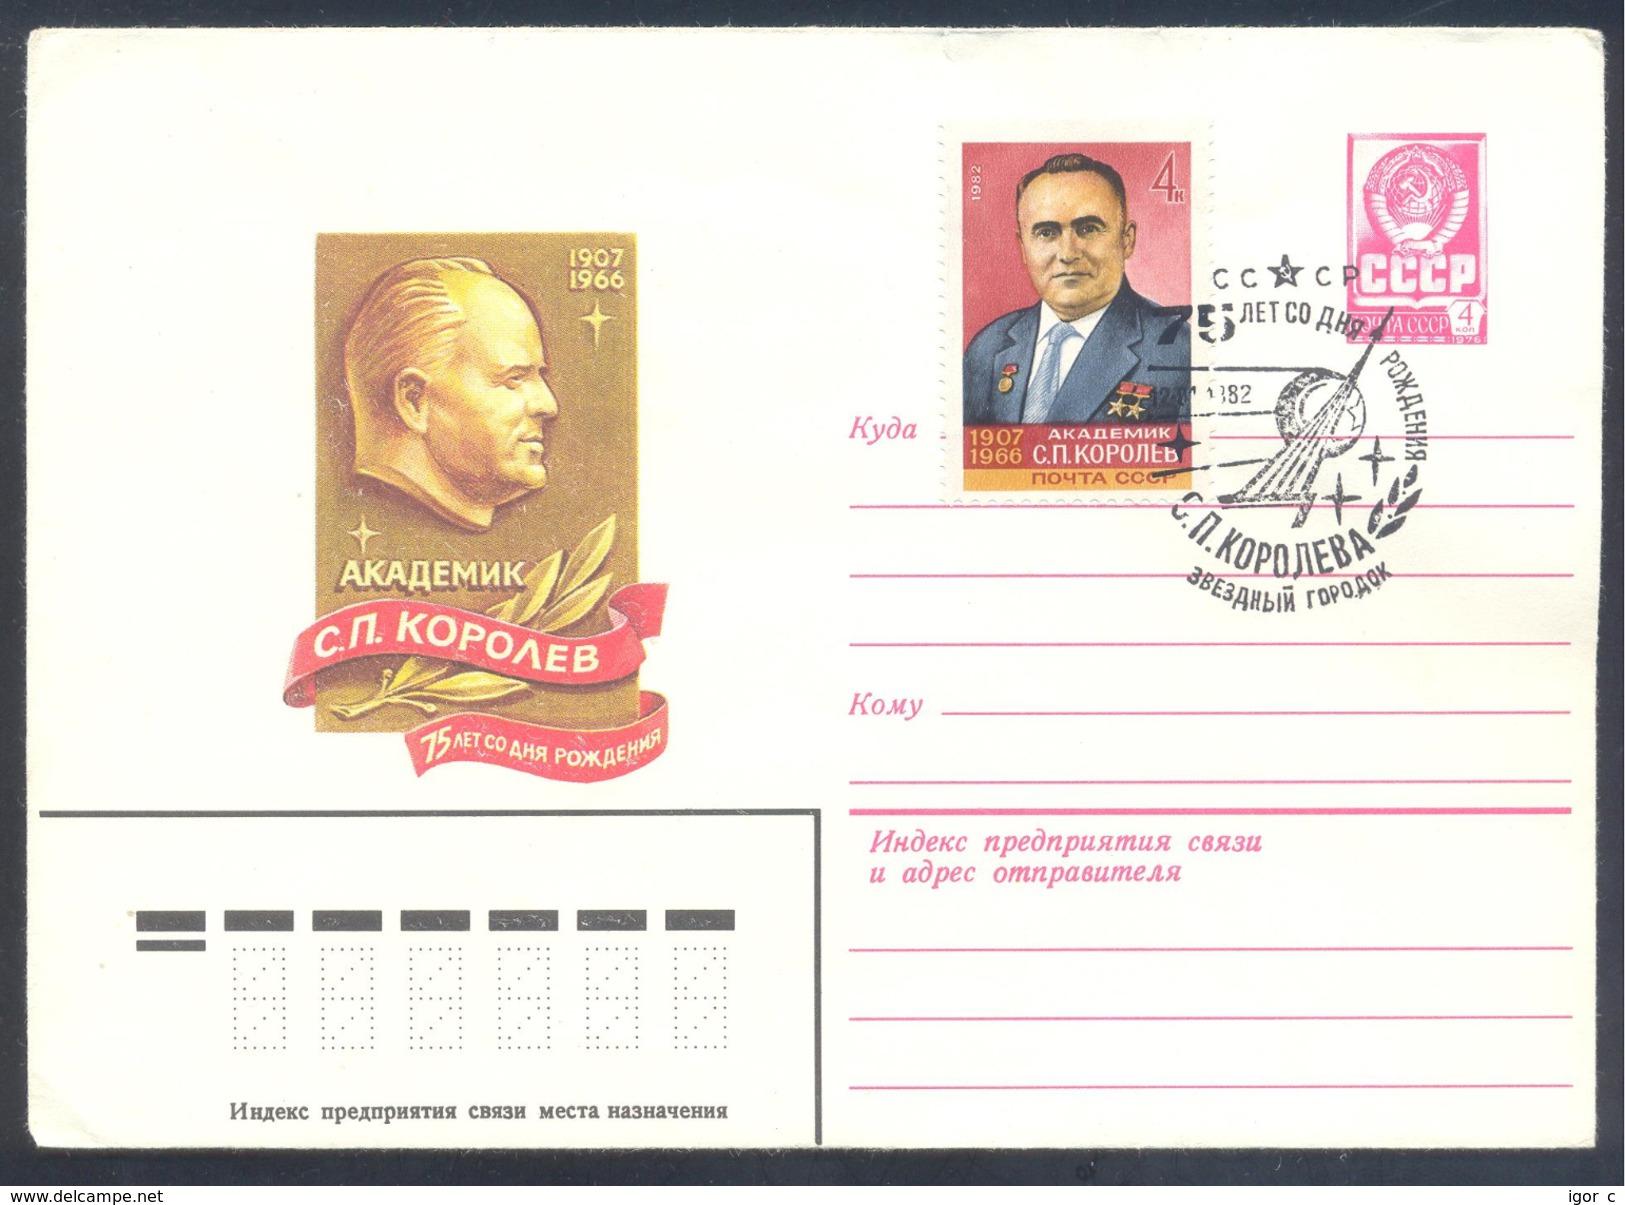 Russia USSR CCCP 1982 Postal Stationery Cover: Space Astronauts Cosmonauts; Sputnik  Korolev - Briefe U. Dokumente